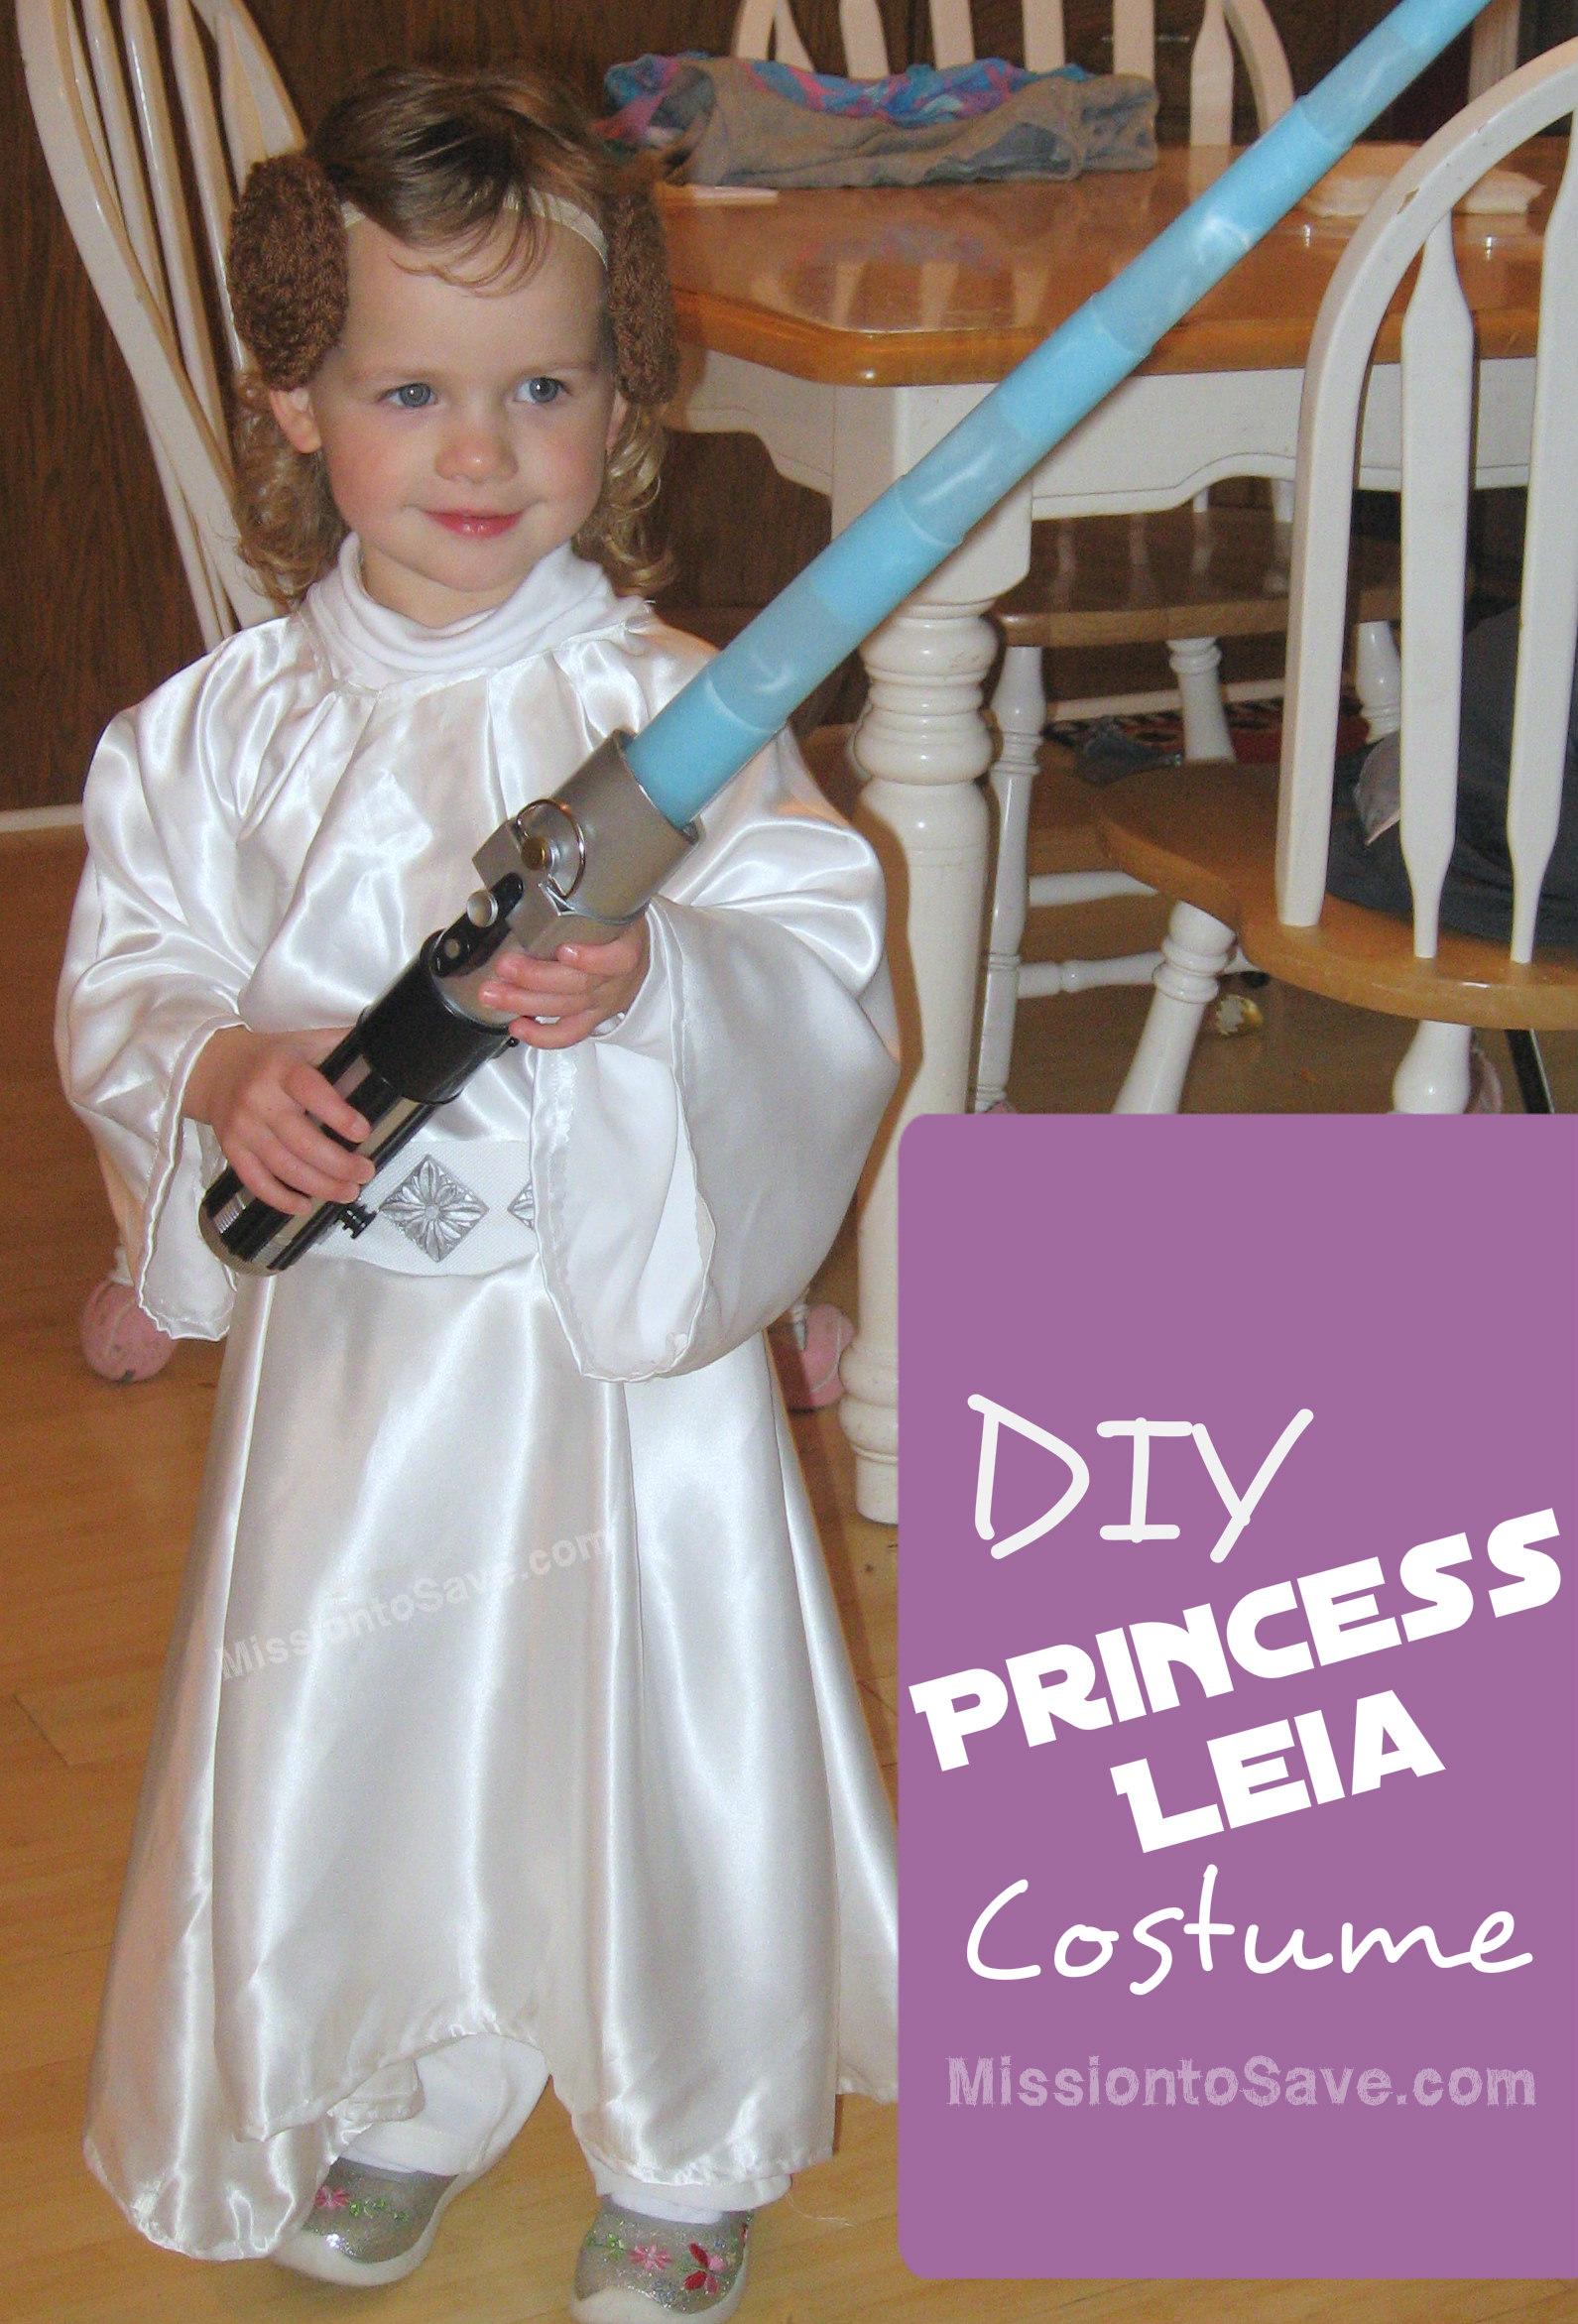 diy star wars costumes jedi and princess leia mission to save. Black Bedroom Furniture Sets. Home Design Ideas